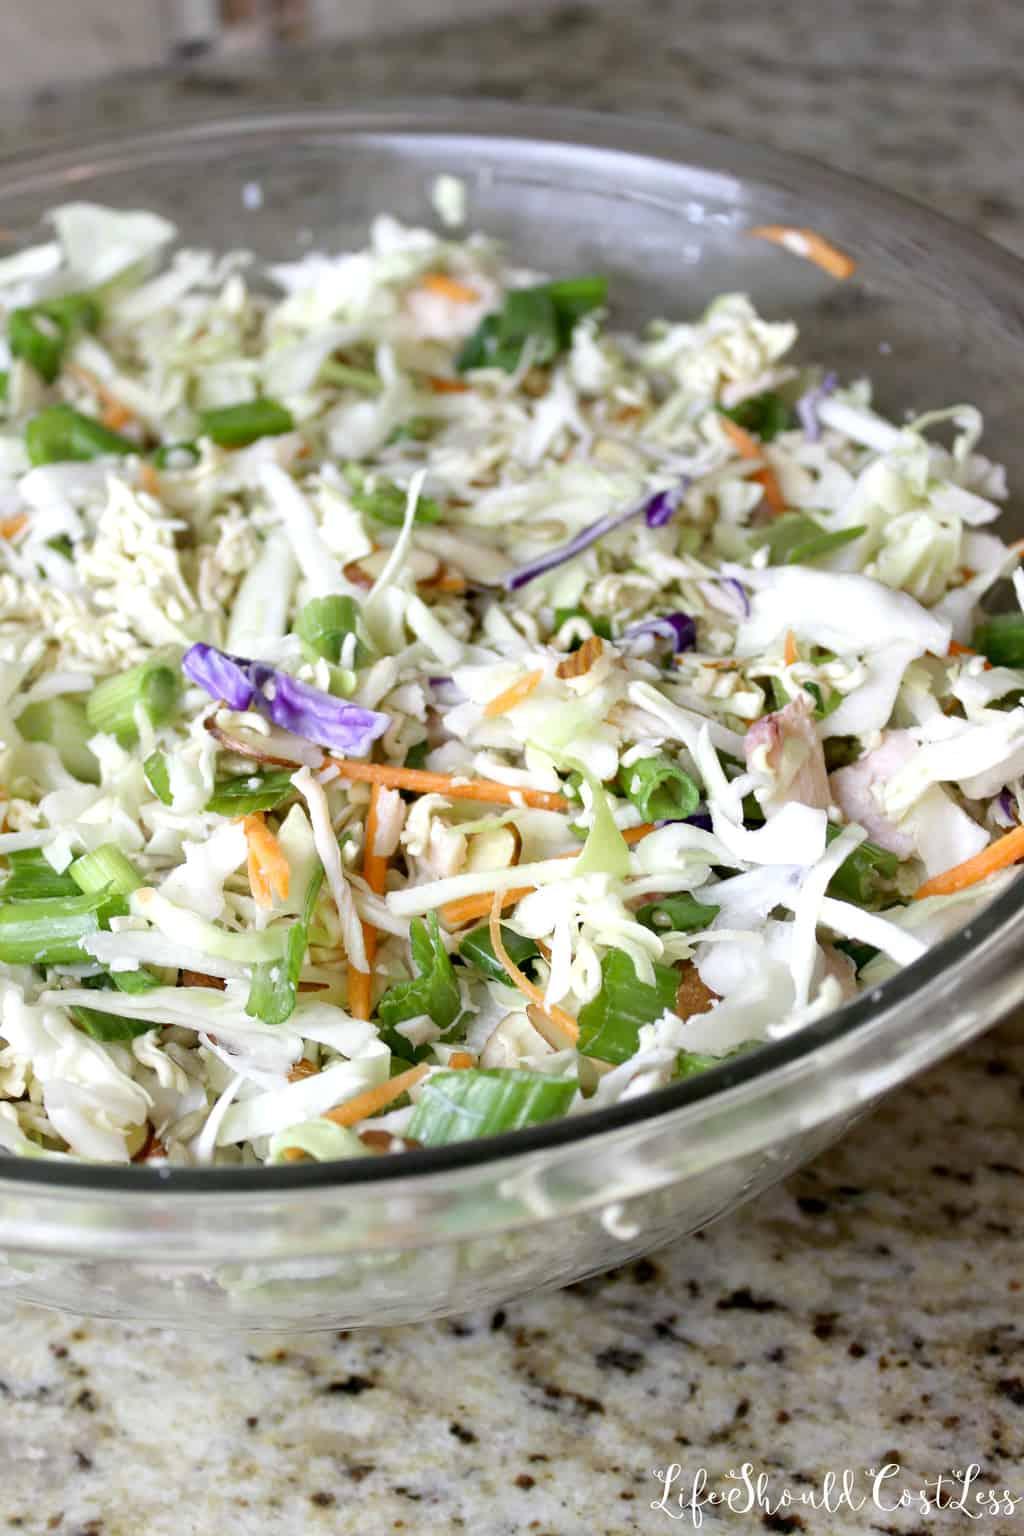 Top Ramen Chicken Salad